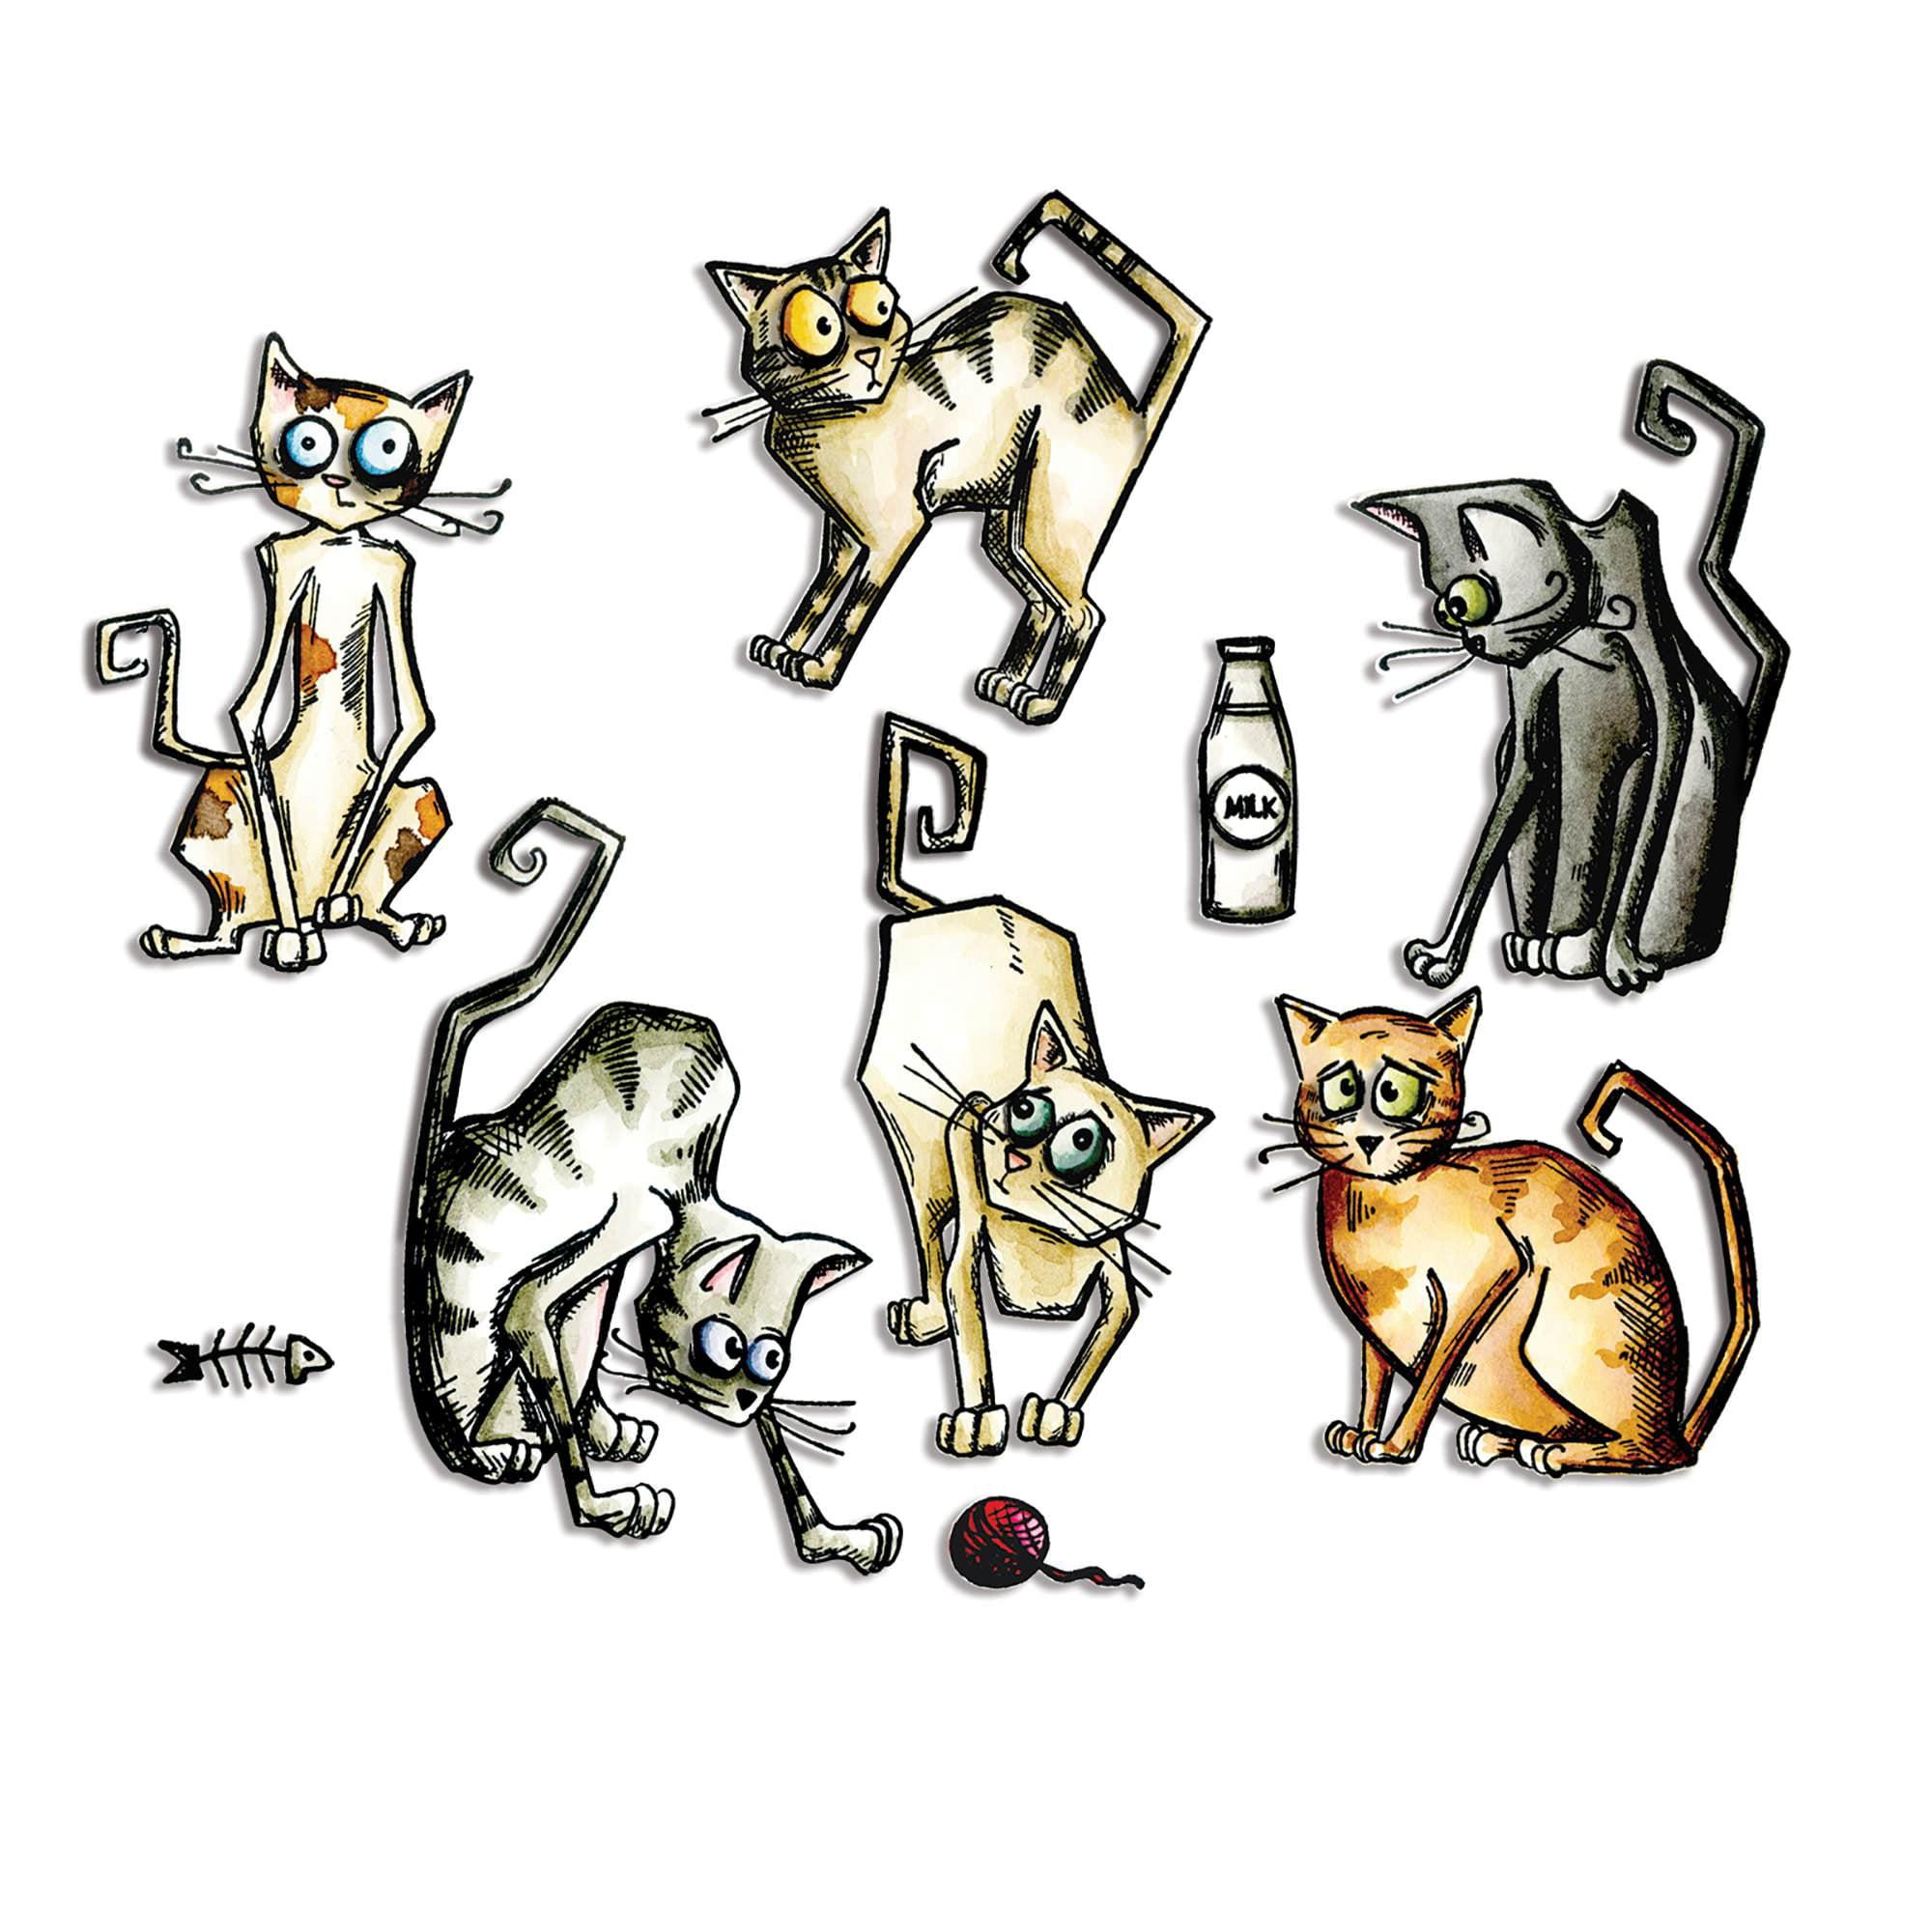 Sizzix Framelits Dies - Crazy Cats by Tim Holtz